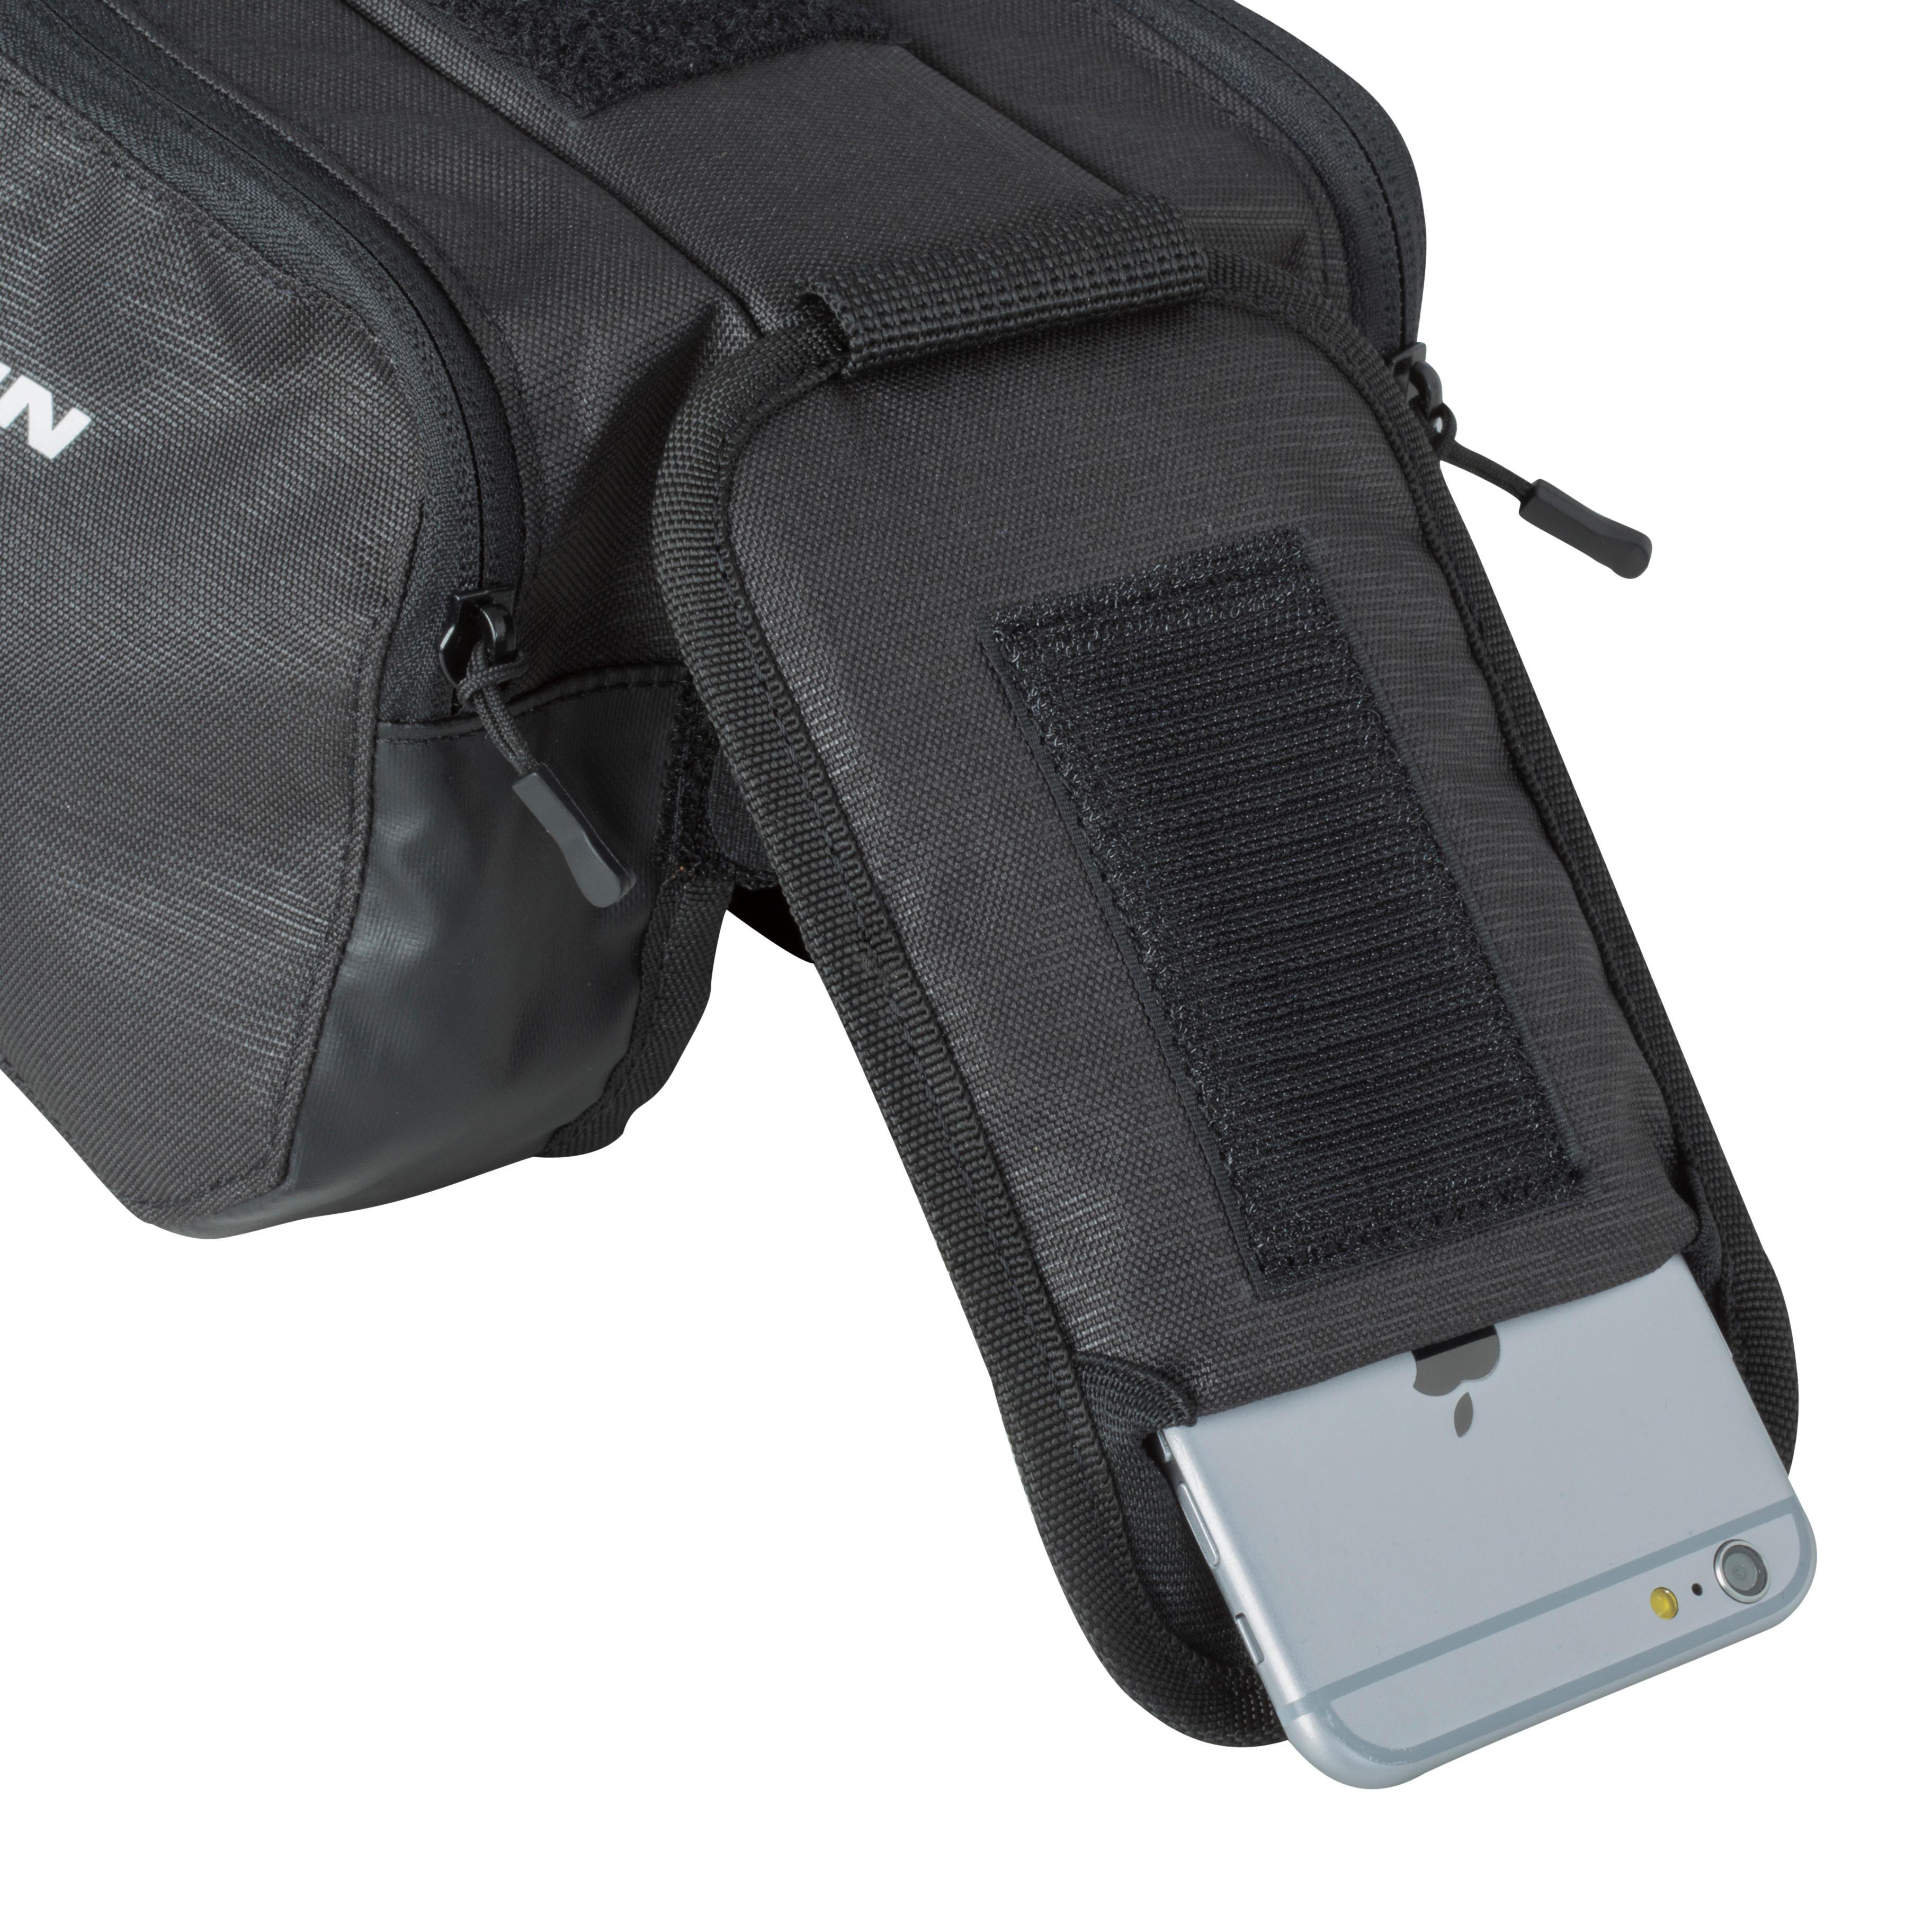 520 Double Bike Frame Bag 2L - Black